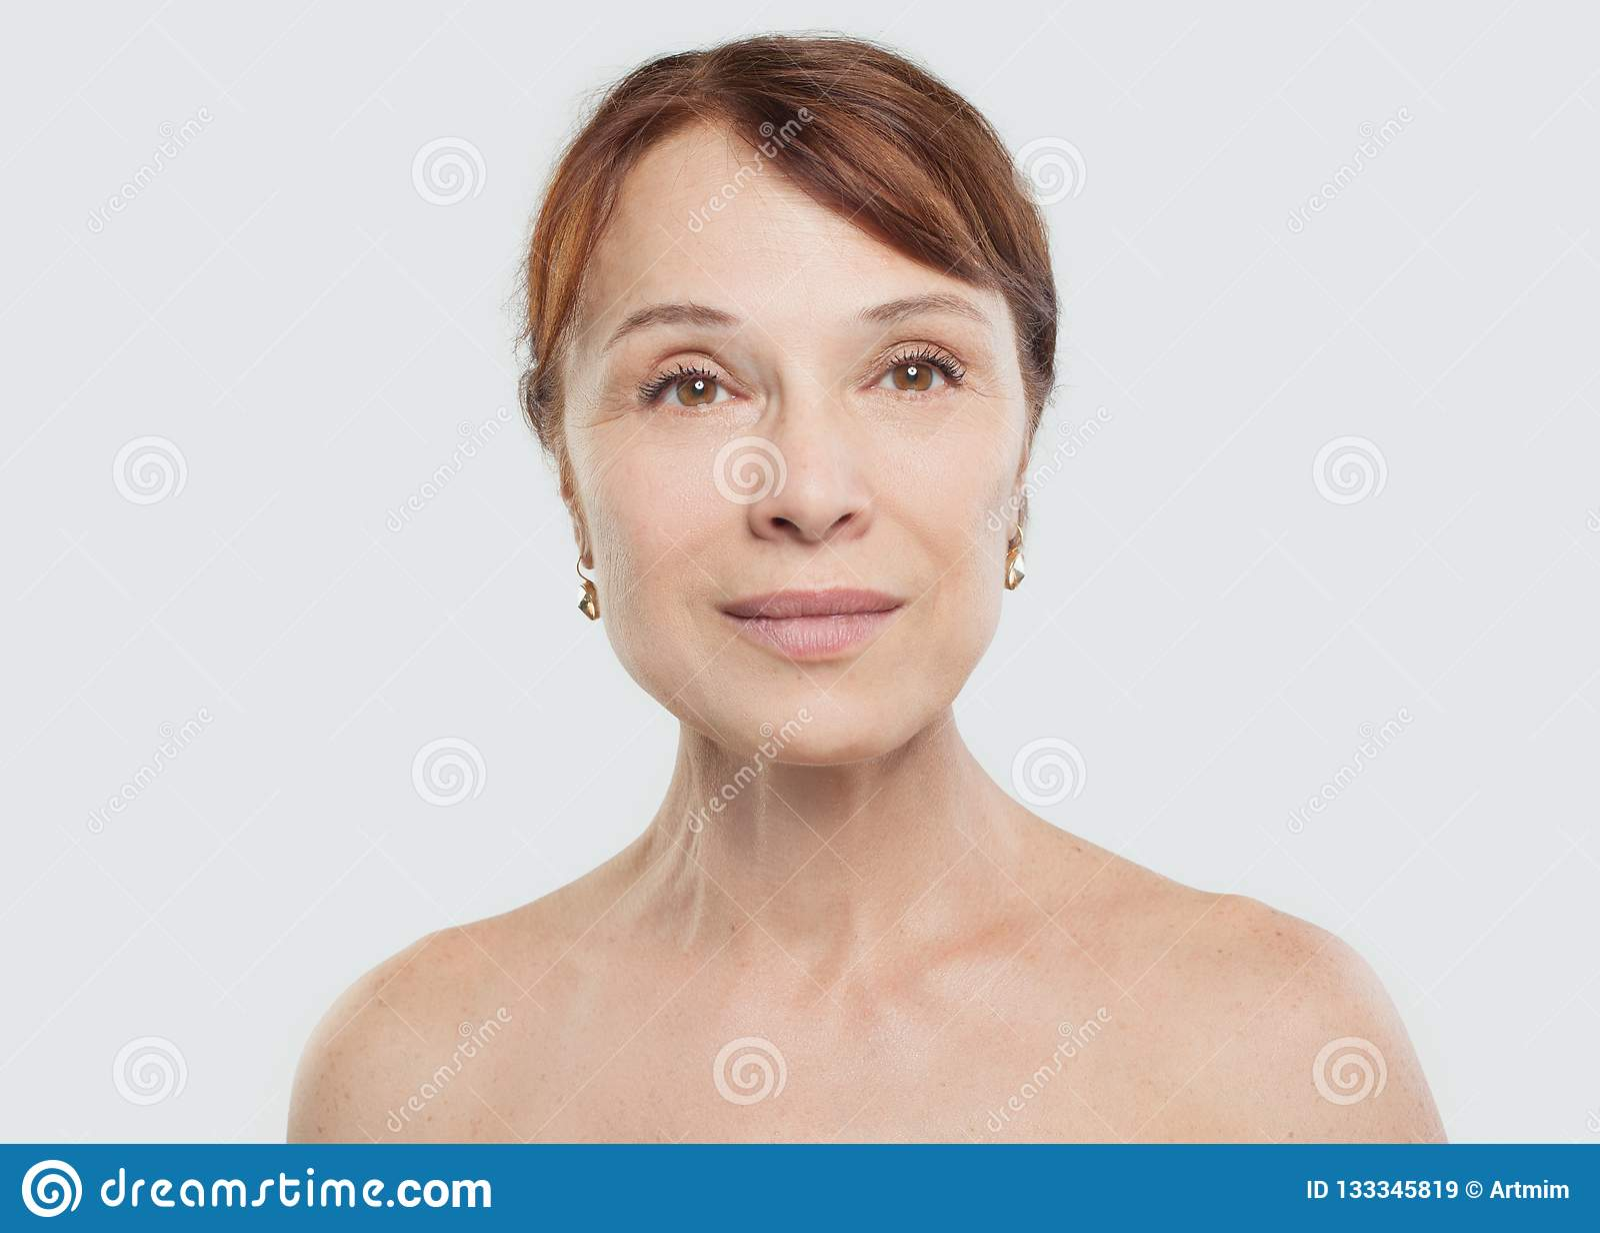 Mature smiling woman Όμορφο μέσο ενήλικο θηλυκό πρόσωπο